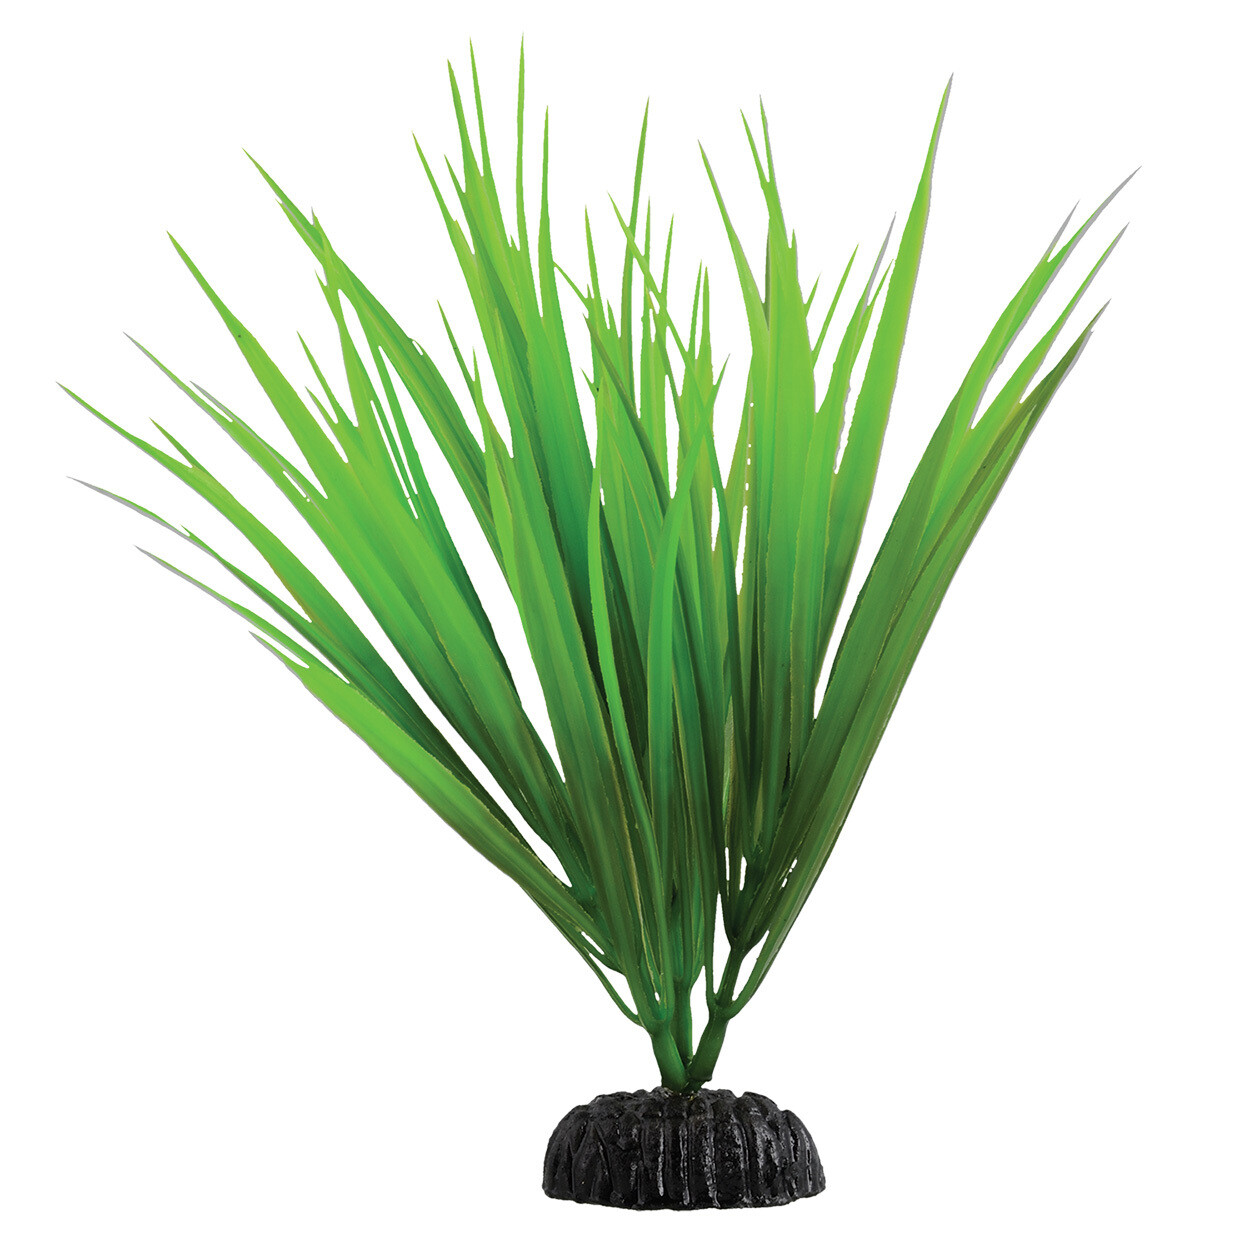 "Underwater Treasures 8"" - Green Nile Grass"